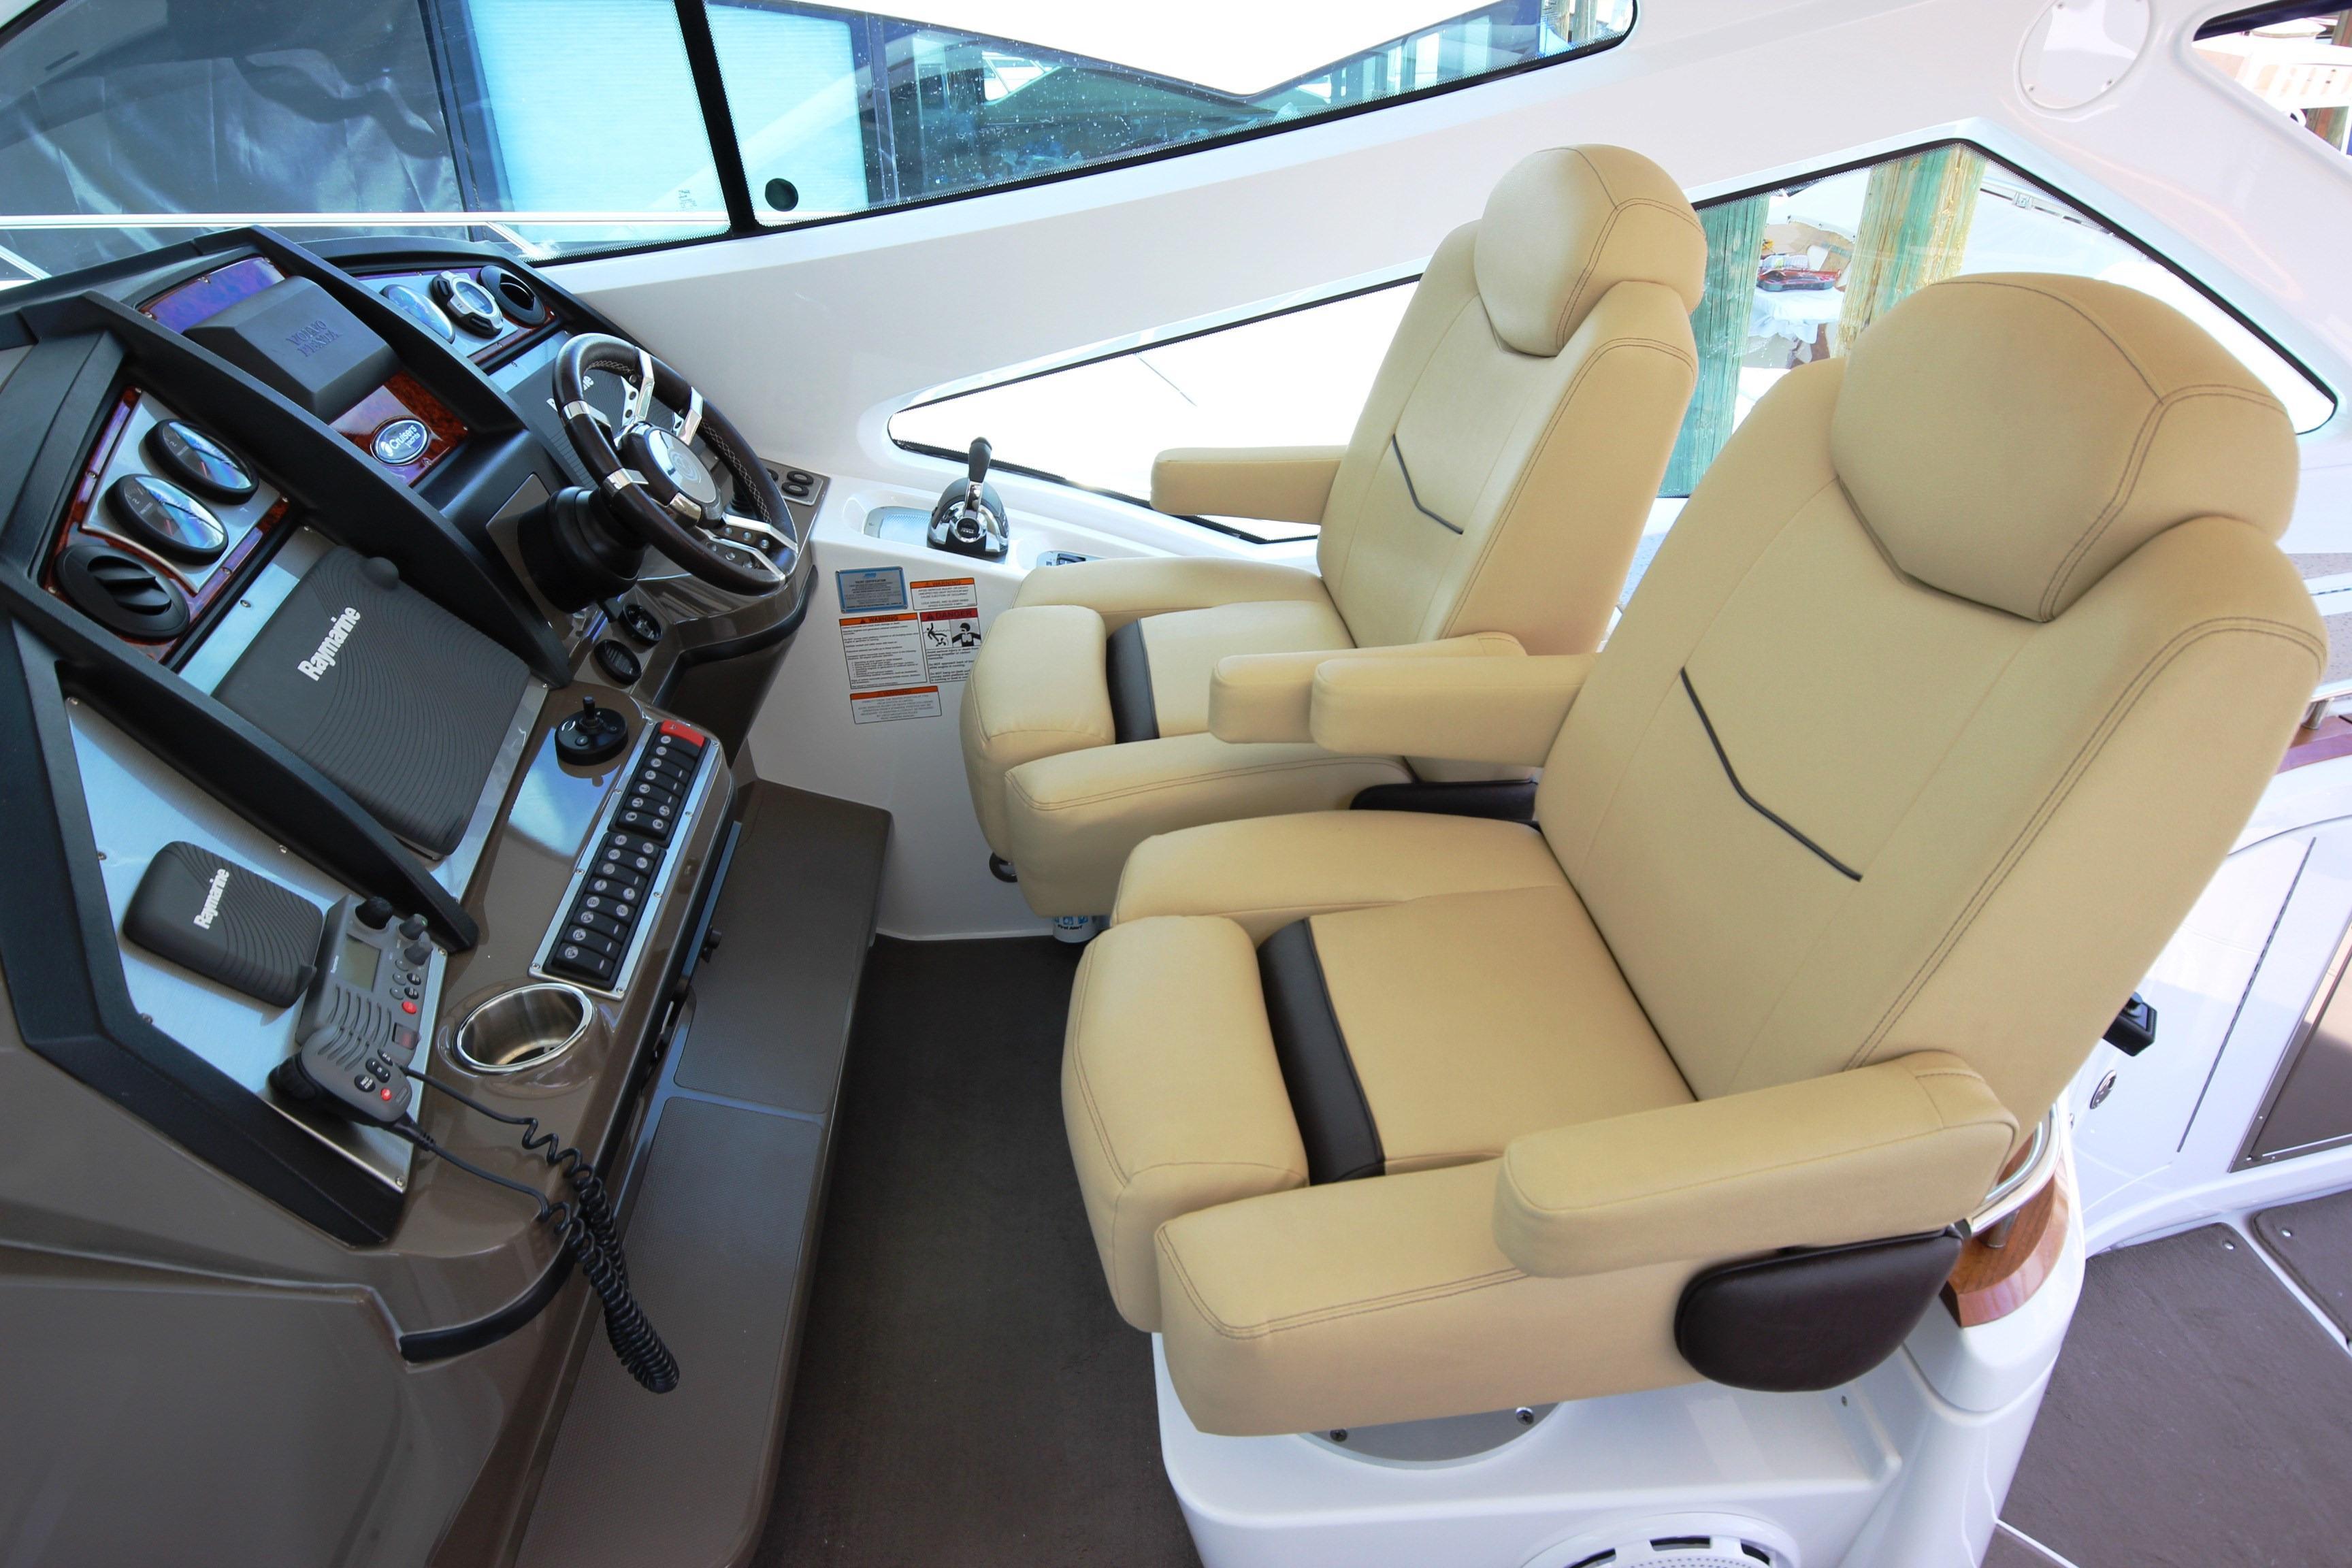 Electrically Adjustable Helm Seats